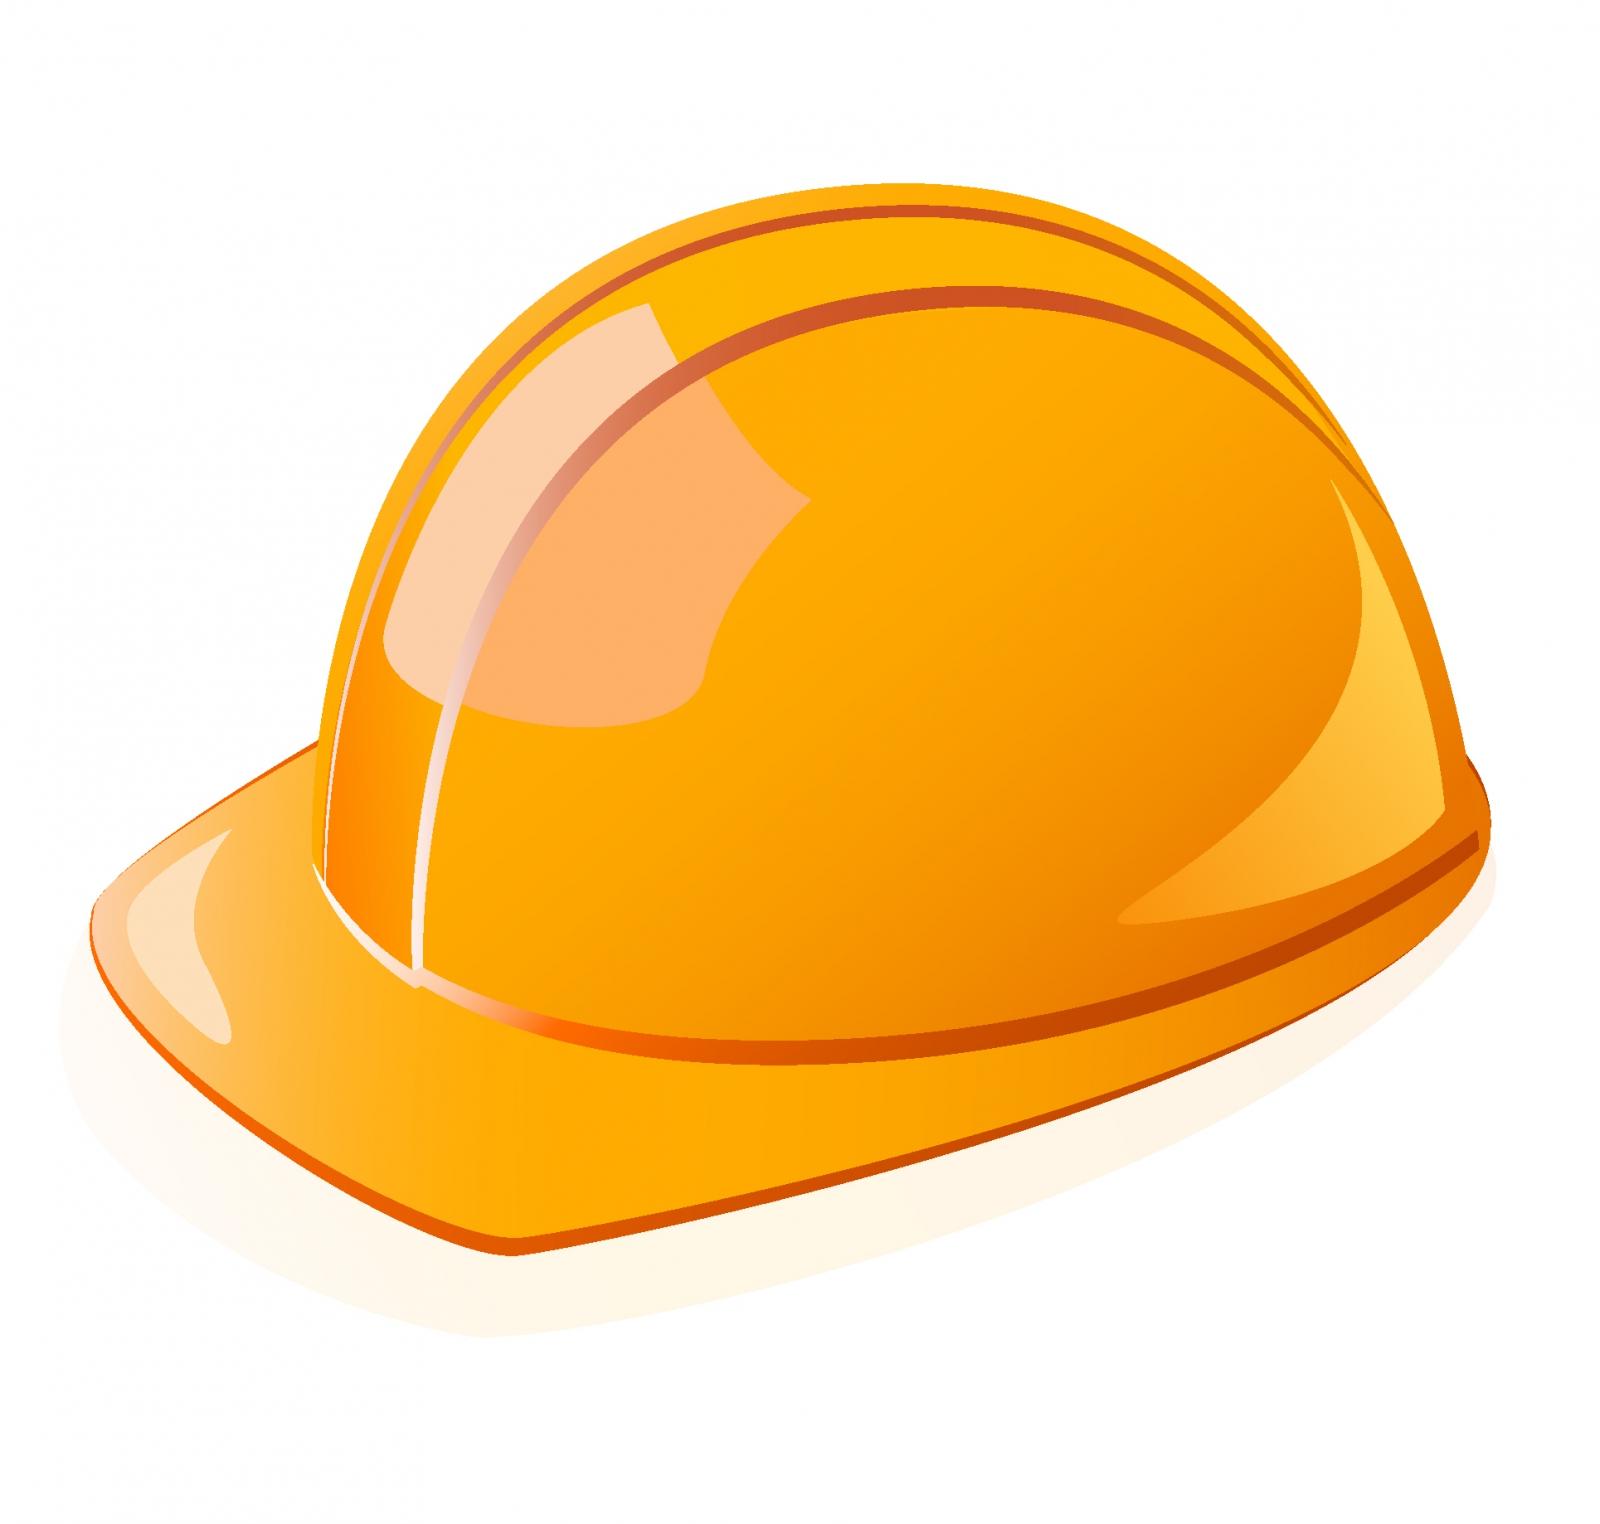 Hardhat clipart graphic transparent Free Construction Hat Cliparts, Download Free Clip Art, Free Clip ... graphic transparent